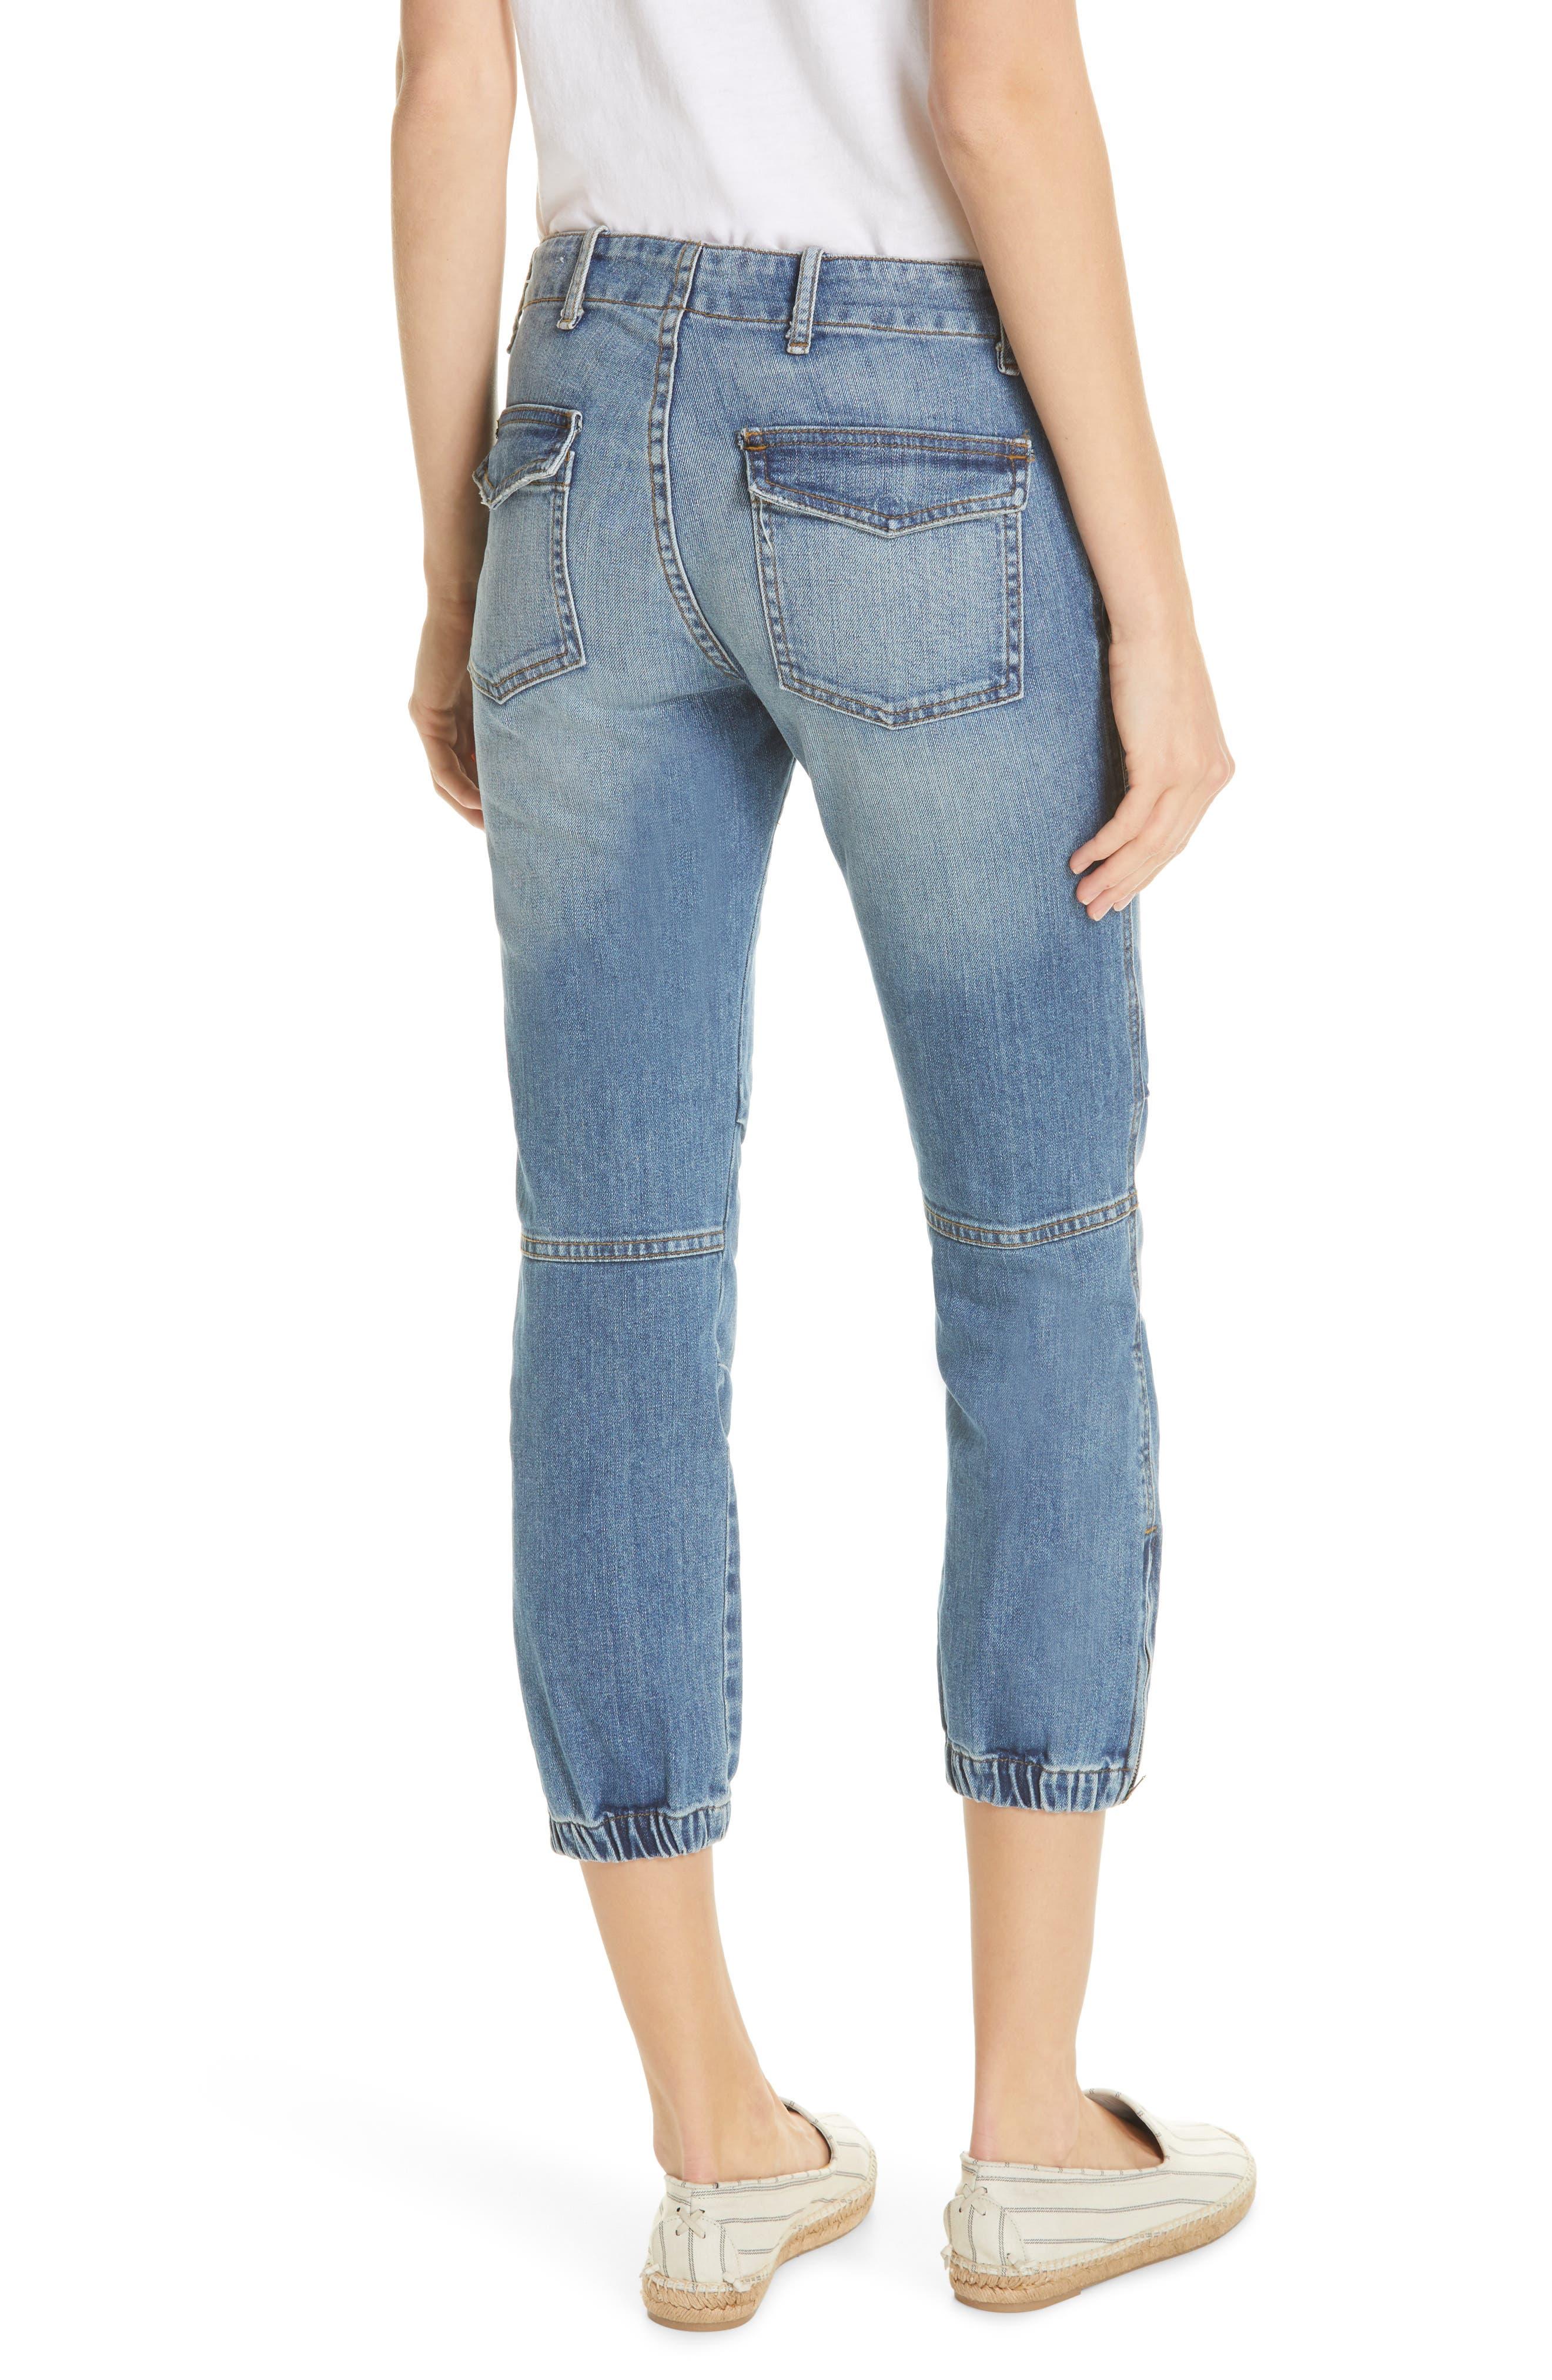 NILI LOTAN, Crop French Military Jeans, Alternate thumbnail 2, color, DUANE WASH